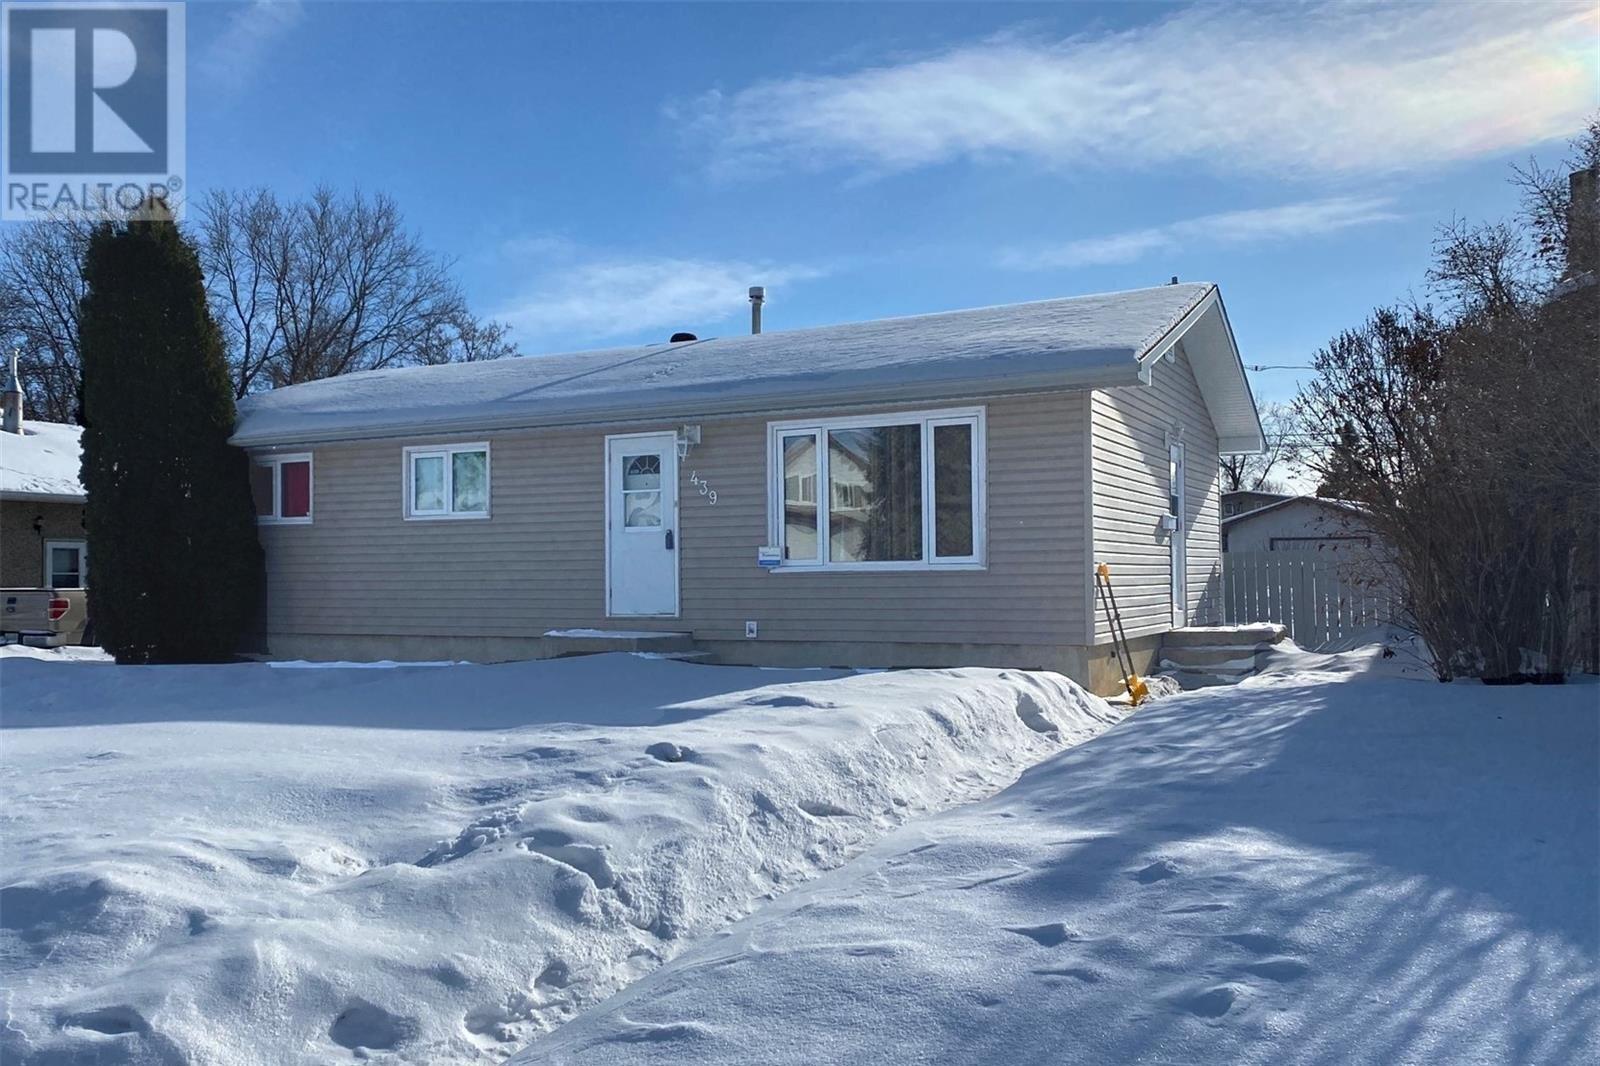 House for sale at 439 27th St E Prince Albert Saskatchewan - MLS: SK827079